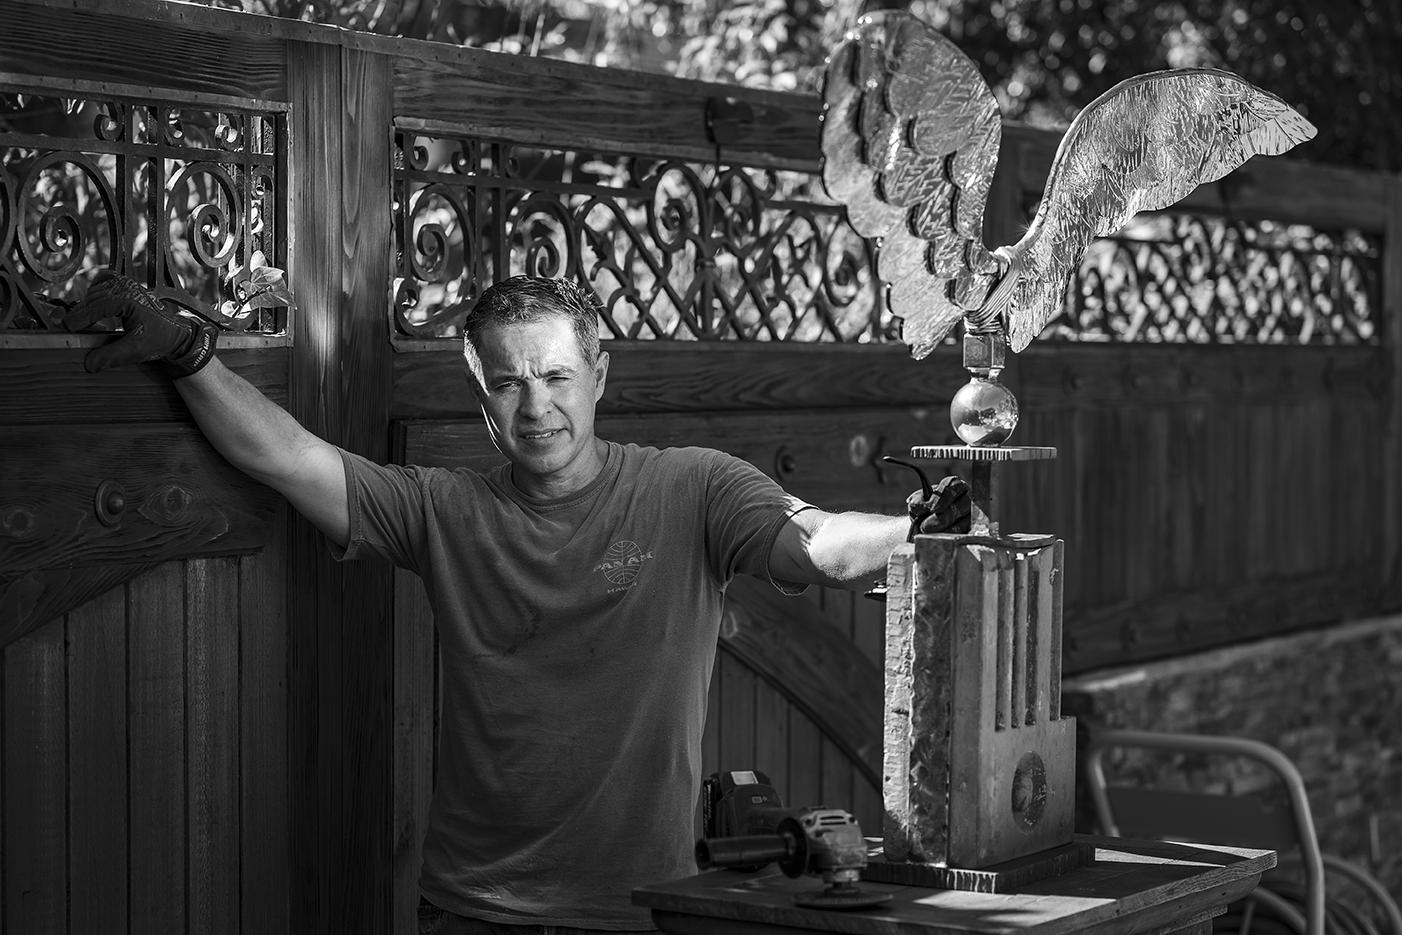 Cesar Mendez #secretlivesweek secret lives doormaker entryways san diego sculpture found art